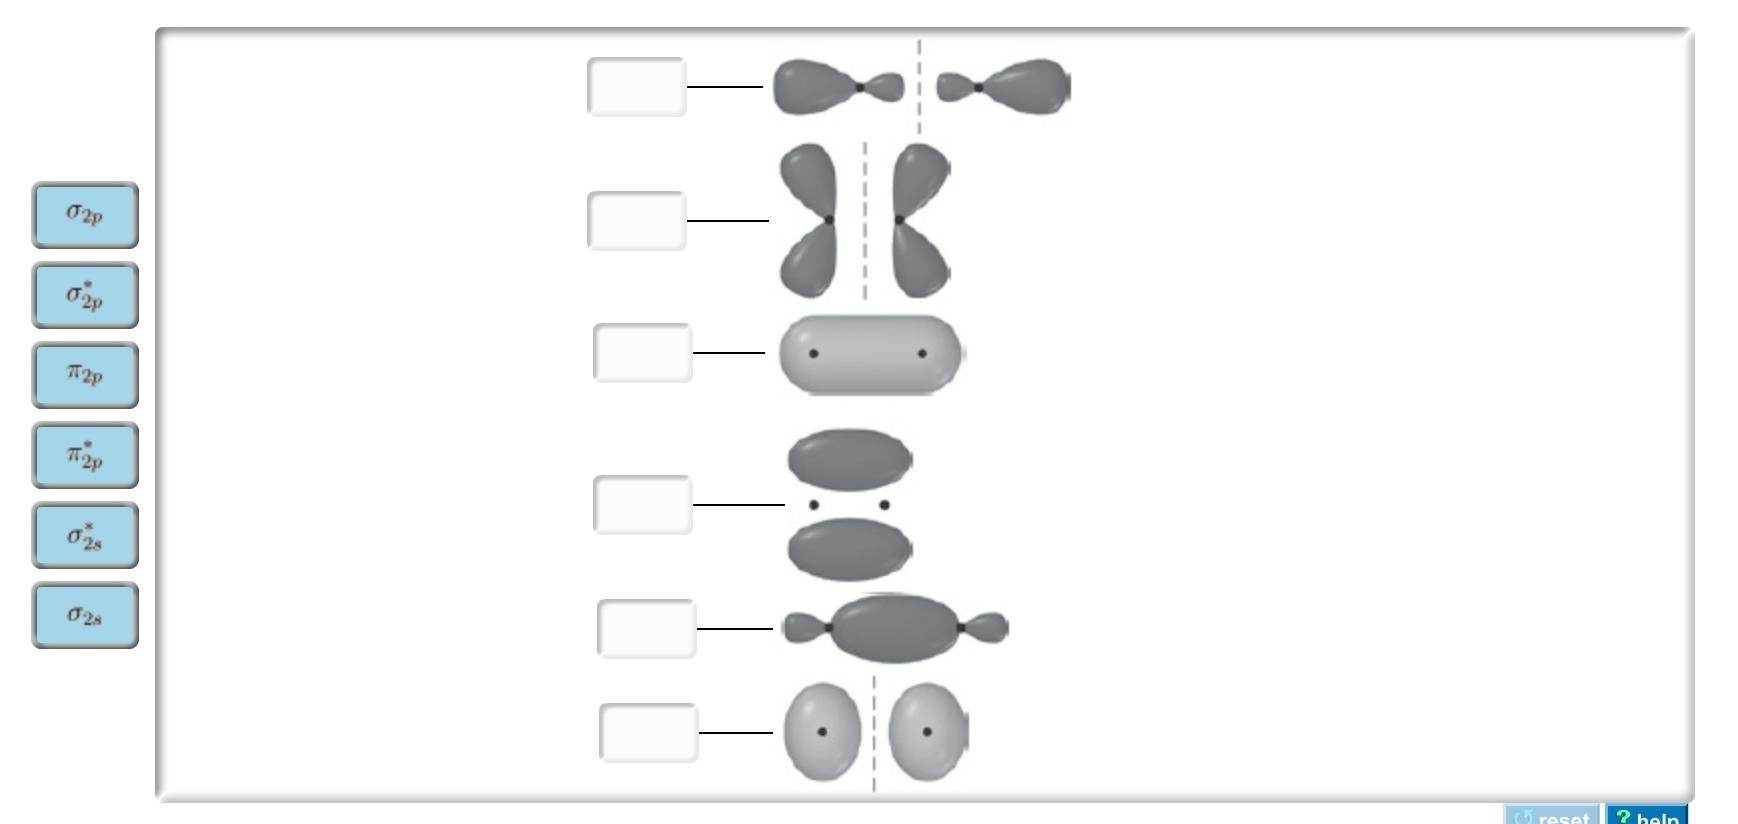 Solved: Sketch Each Molecular Orbital. Drag The Appropriat